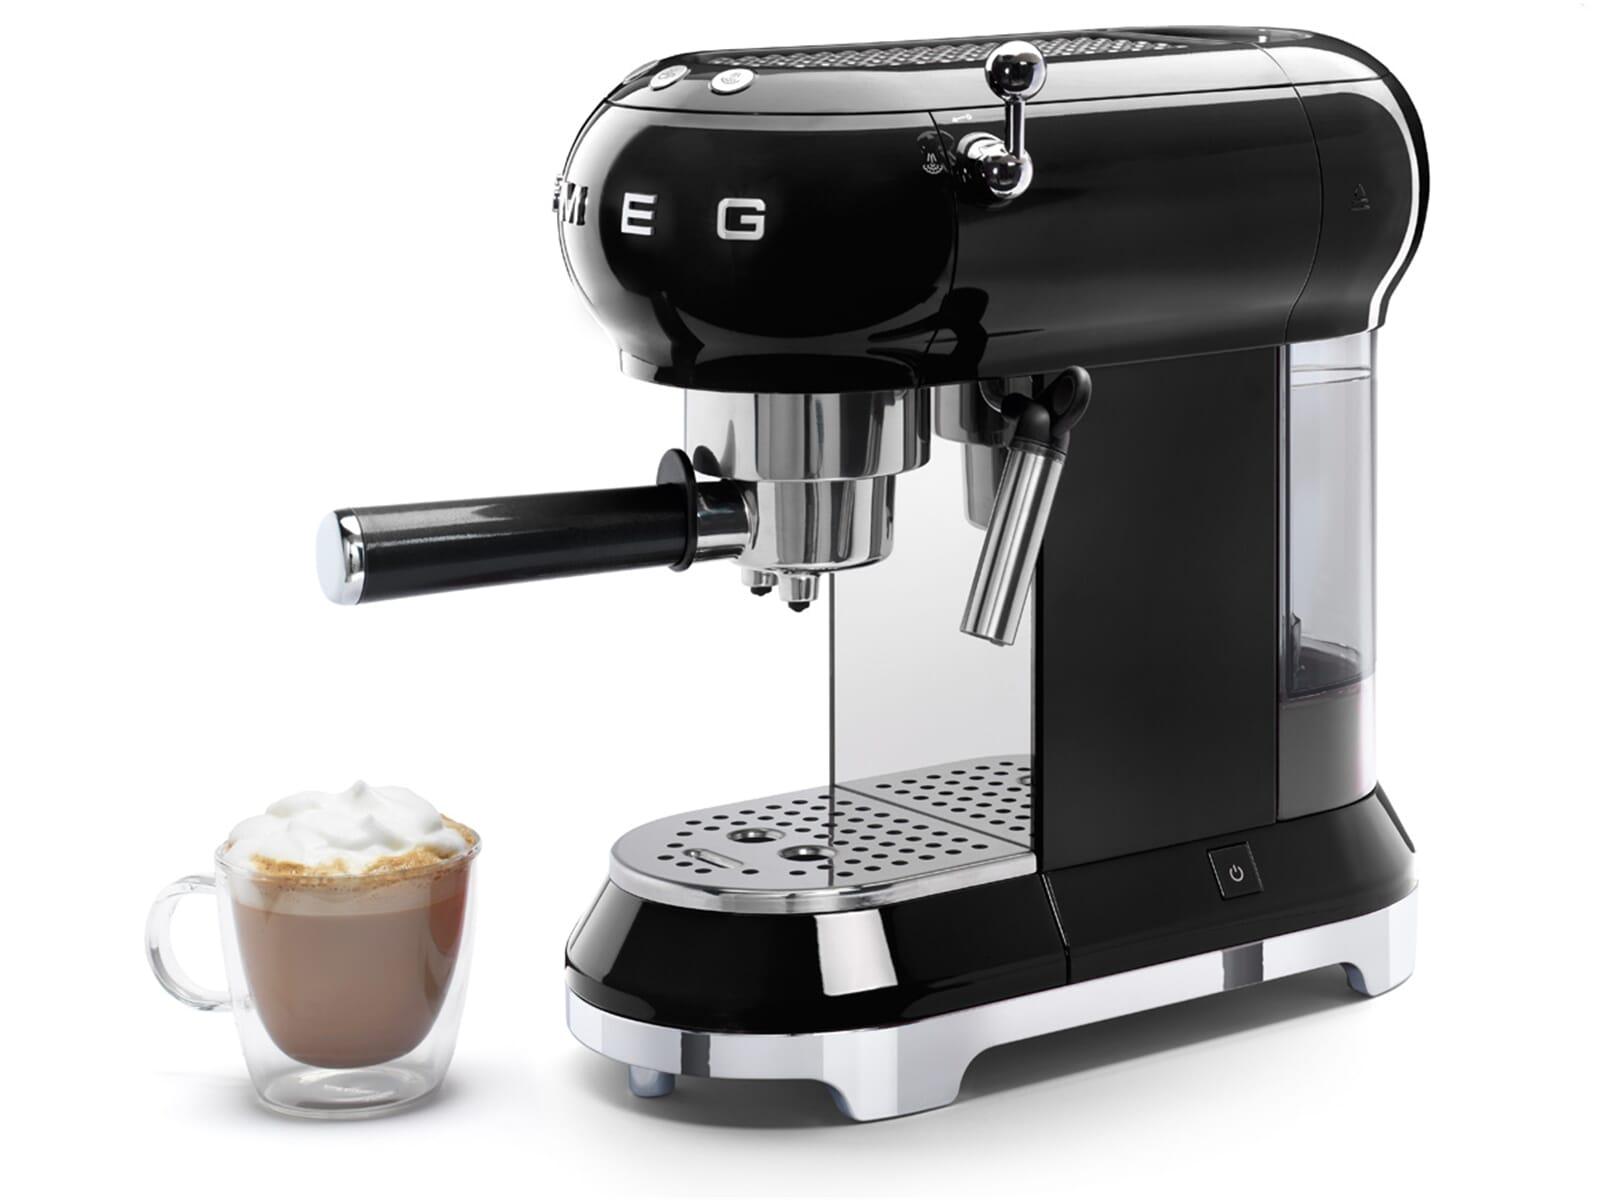 smeg ecf01bleu espresso kaffeemaschine schwarz. Black Bedroom Furniture Sets. Home Design Ideas